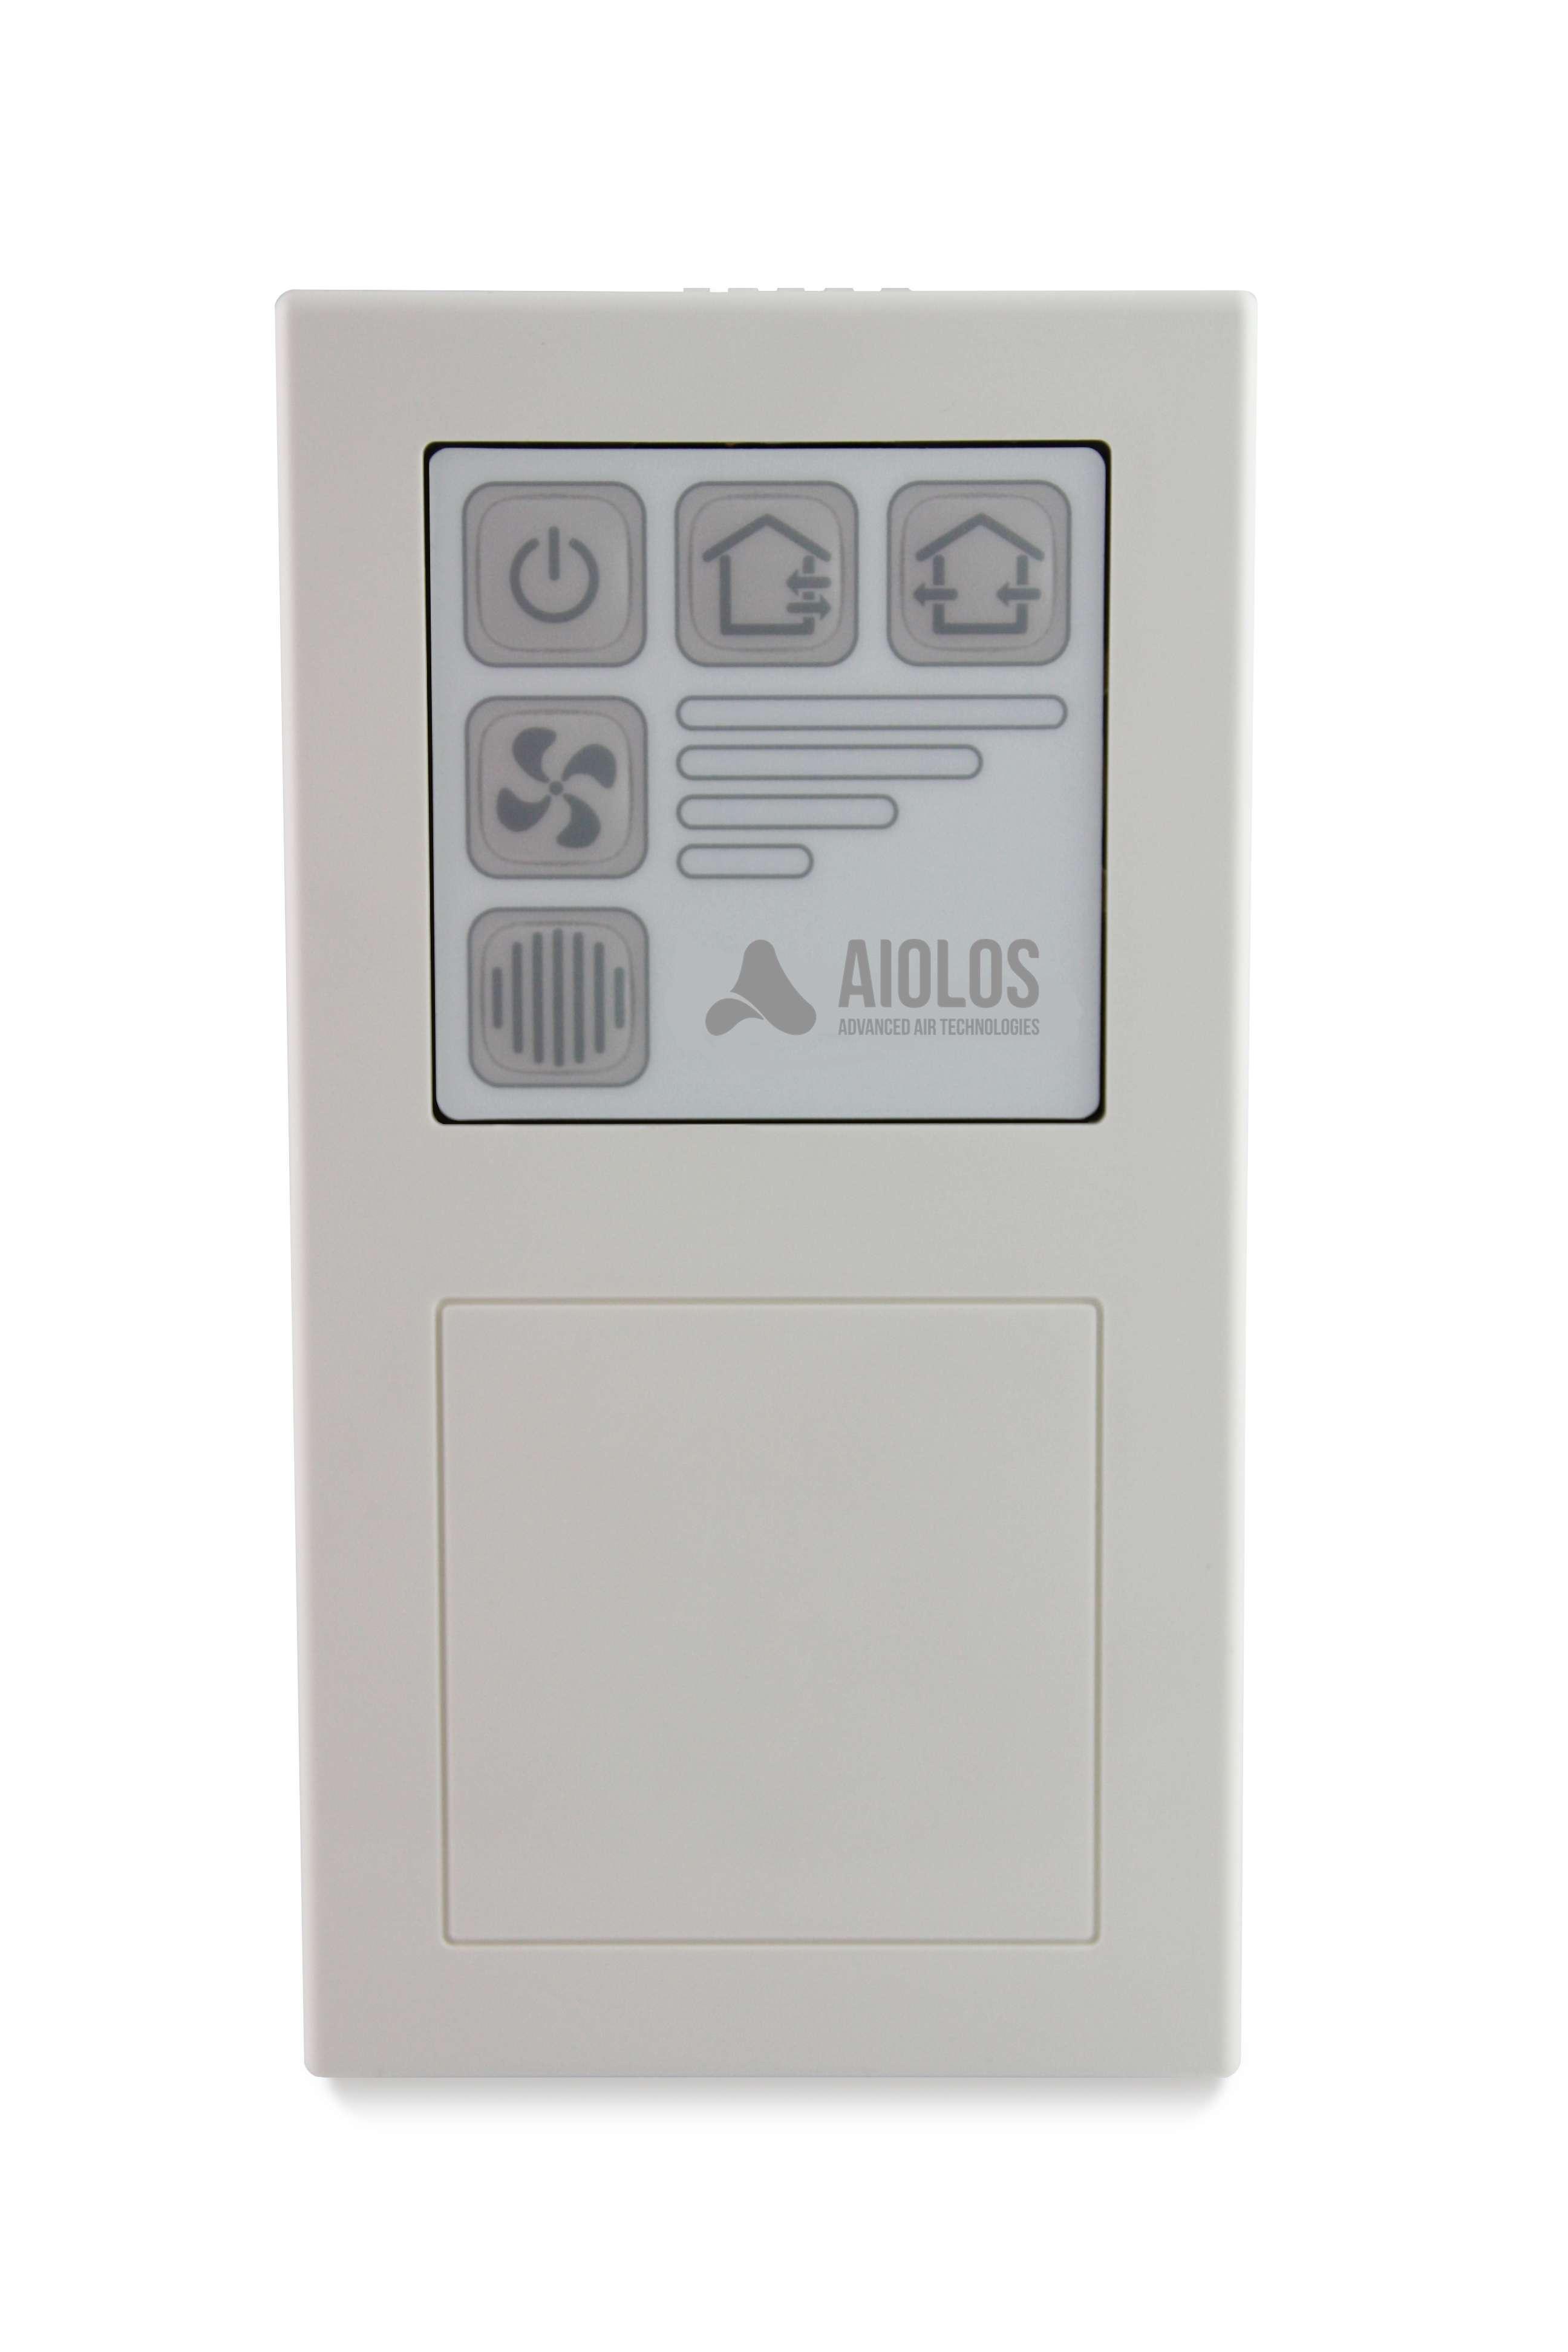 CentralControl Zentralregler für AiolosAir Lüftungsgeräte